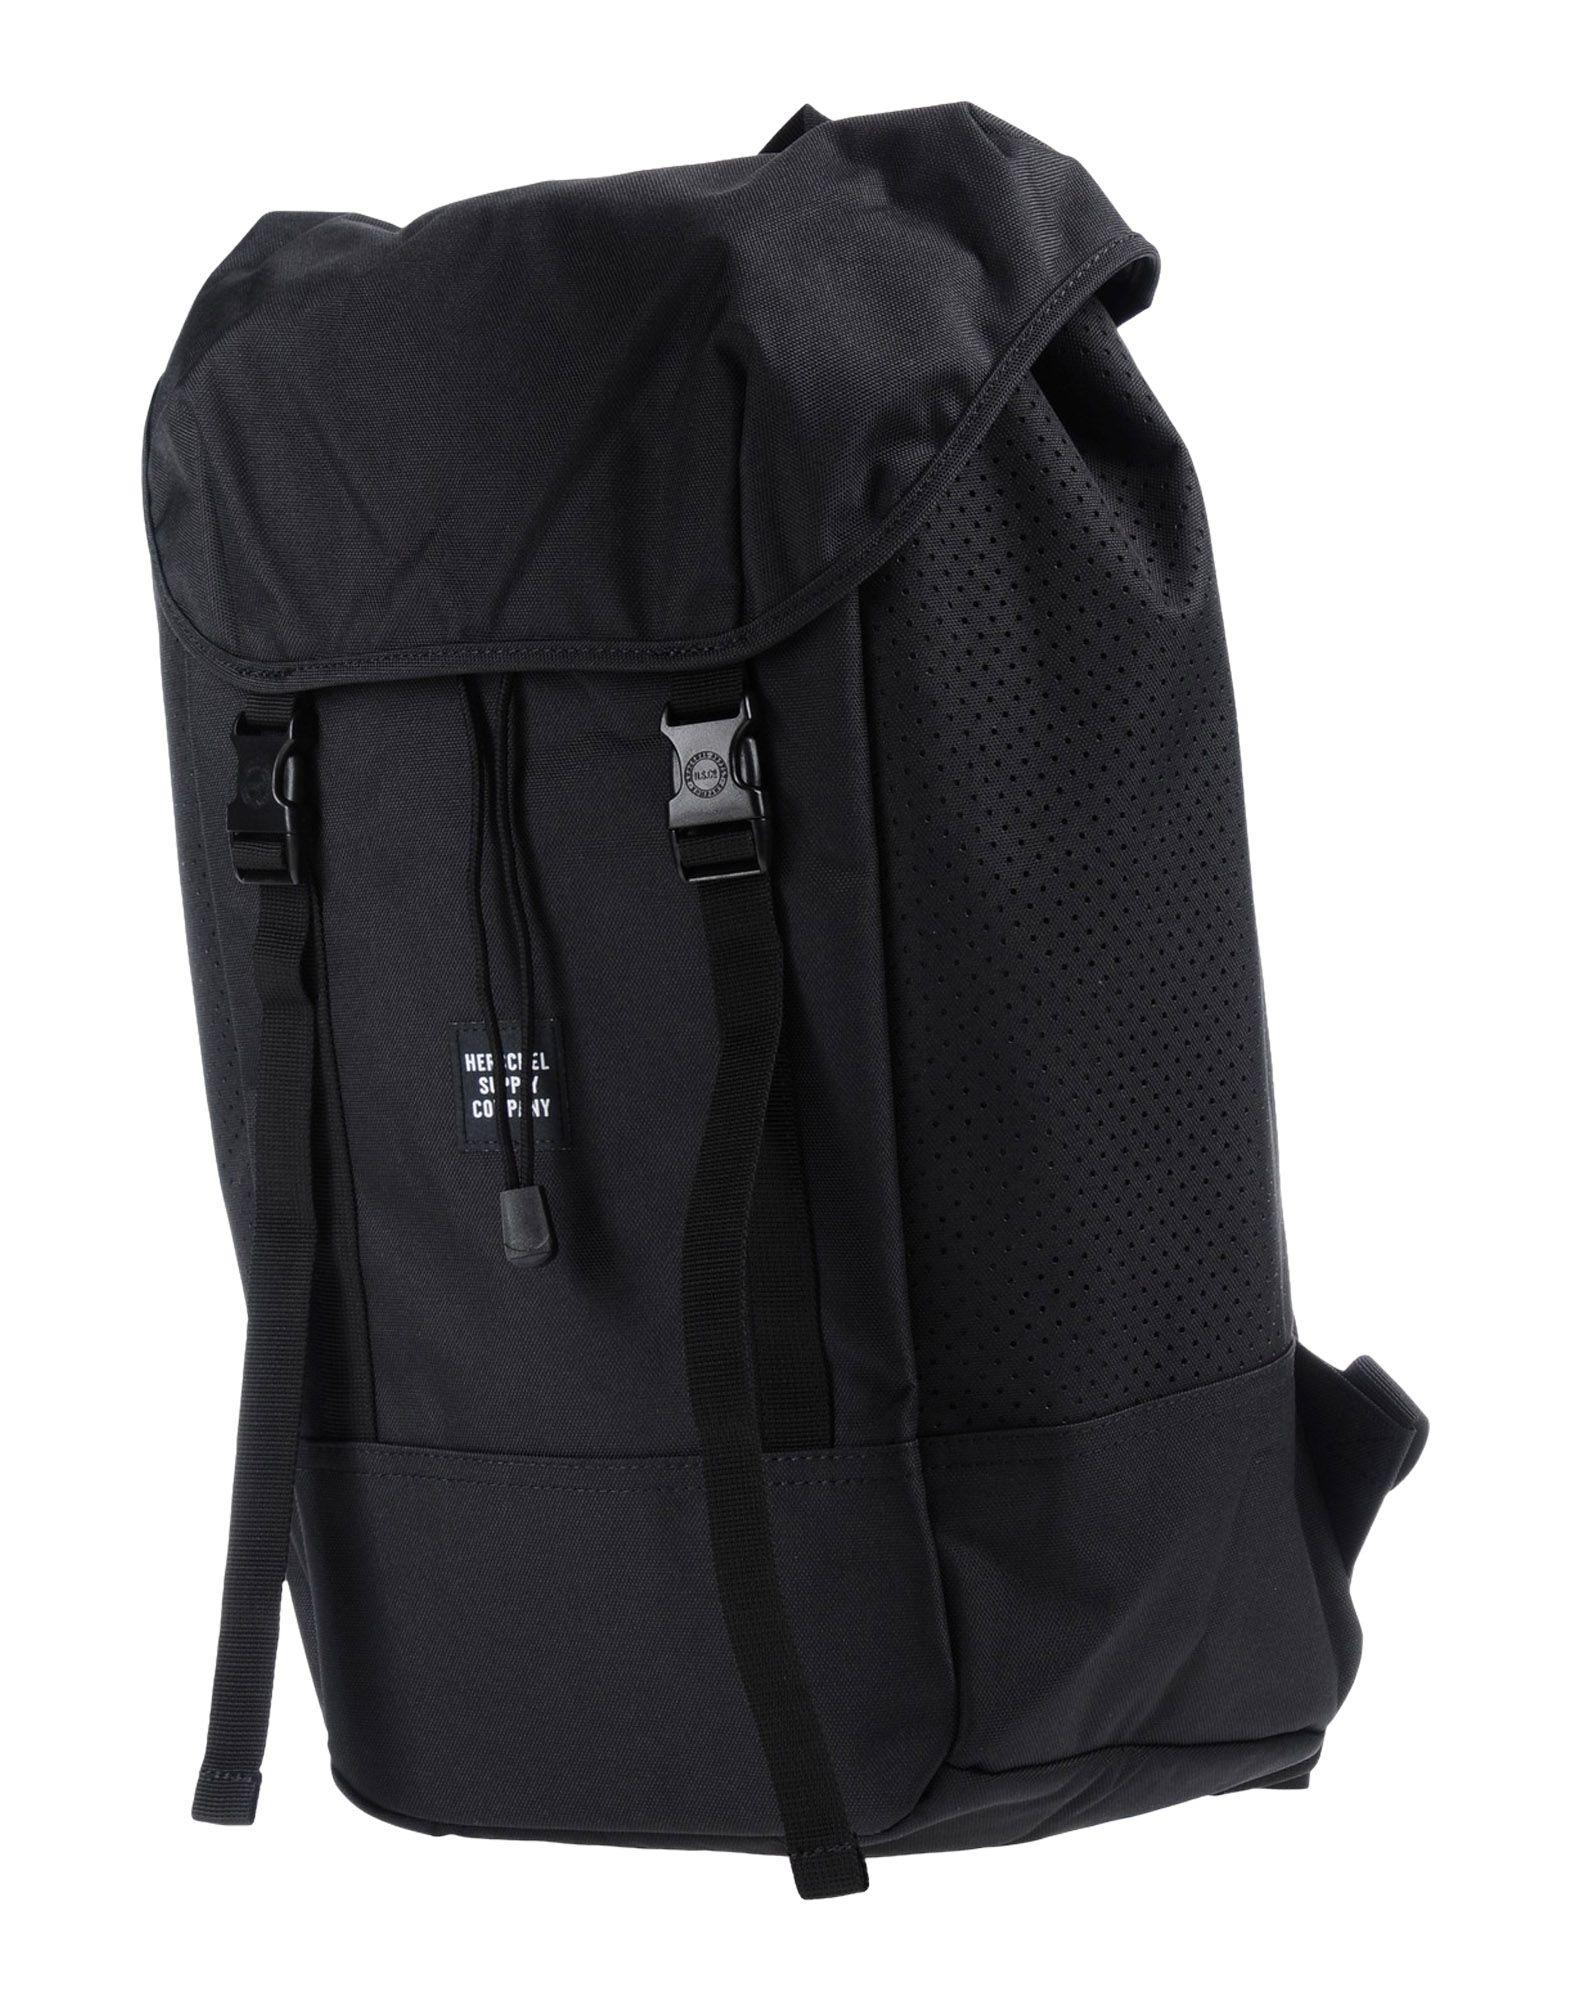 Backpack & fanny pack